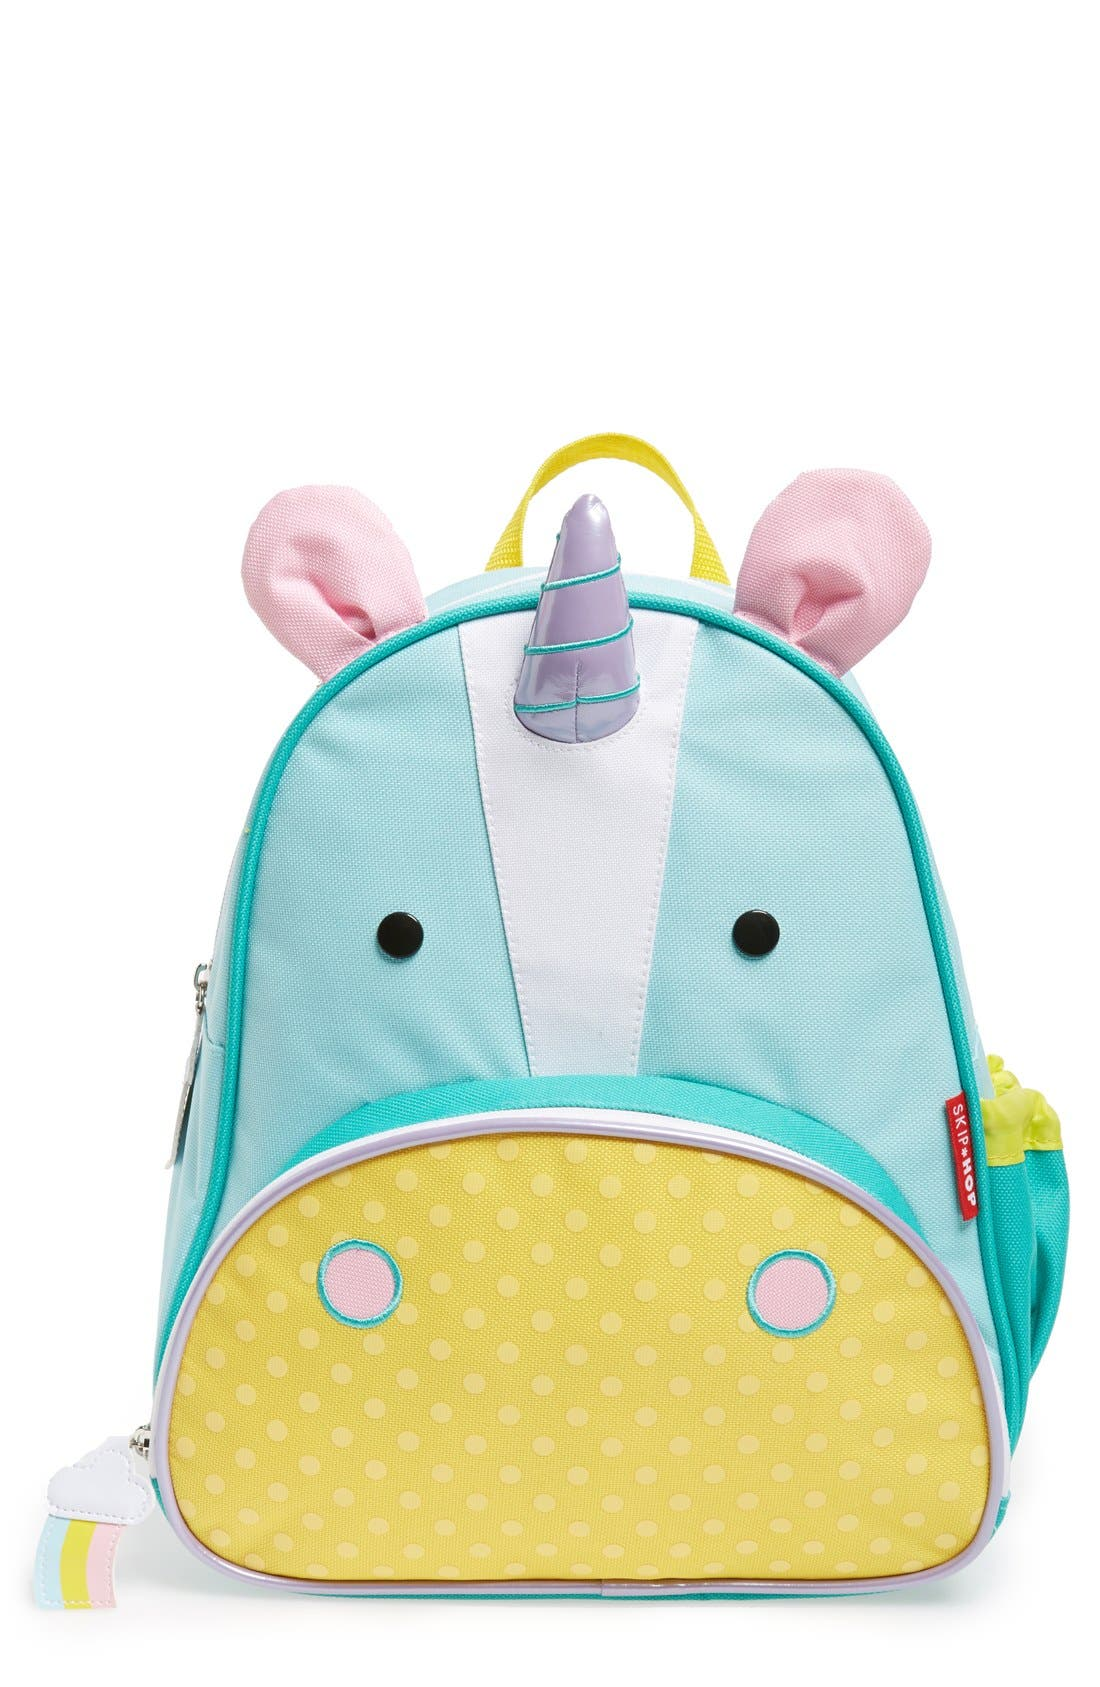 Zoo Pack Backpack,                             Main thumbnail 1, color,                             YELLOW